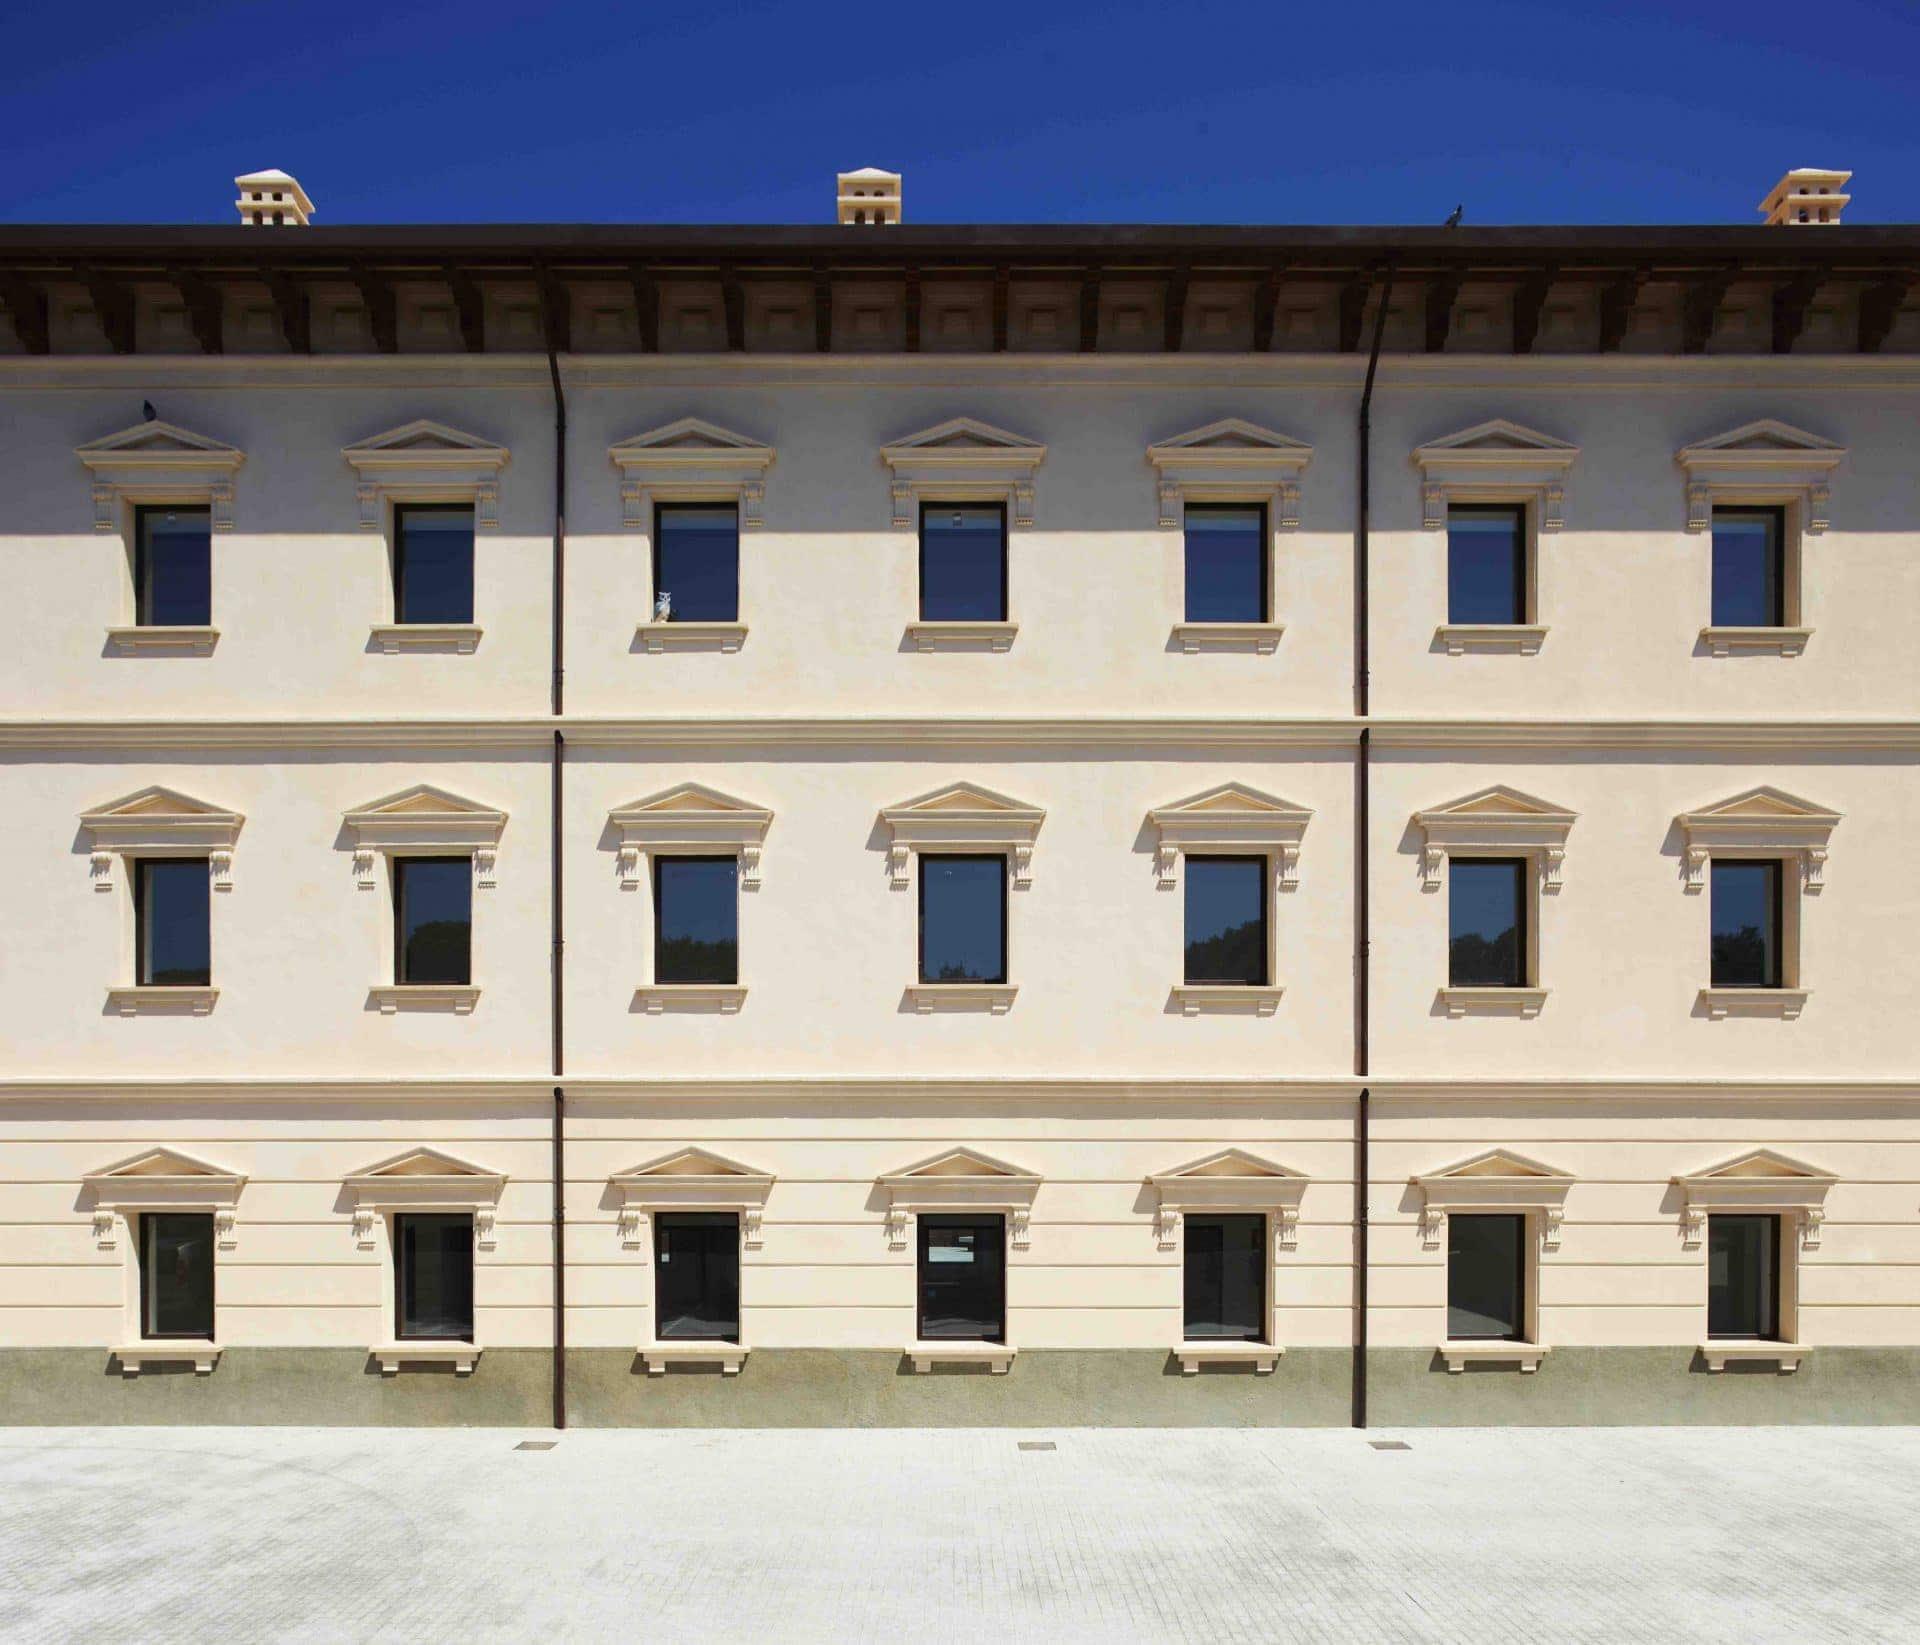 Ferrovial Agroman has tranformed Ibiza barracks into the Ibiza campus of Universitat de les Illes Balears.